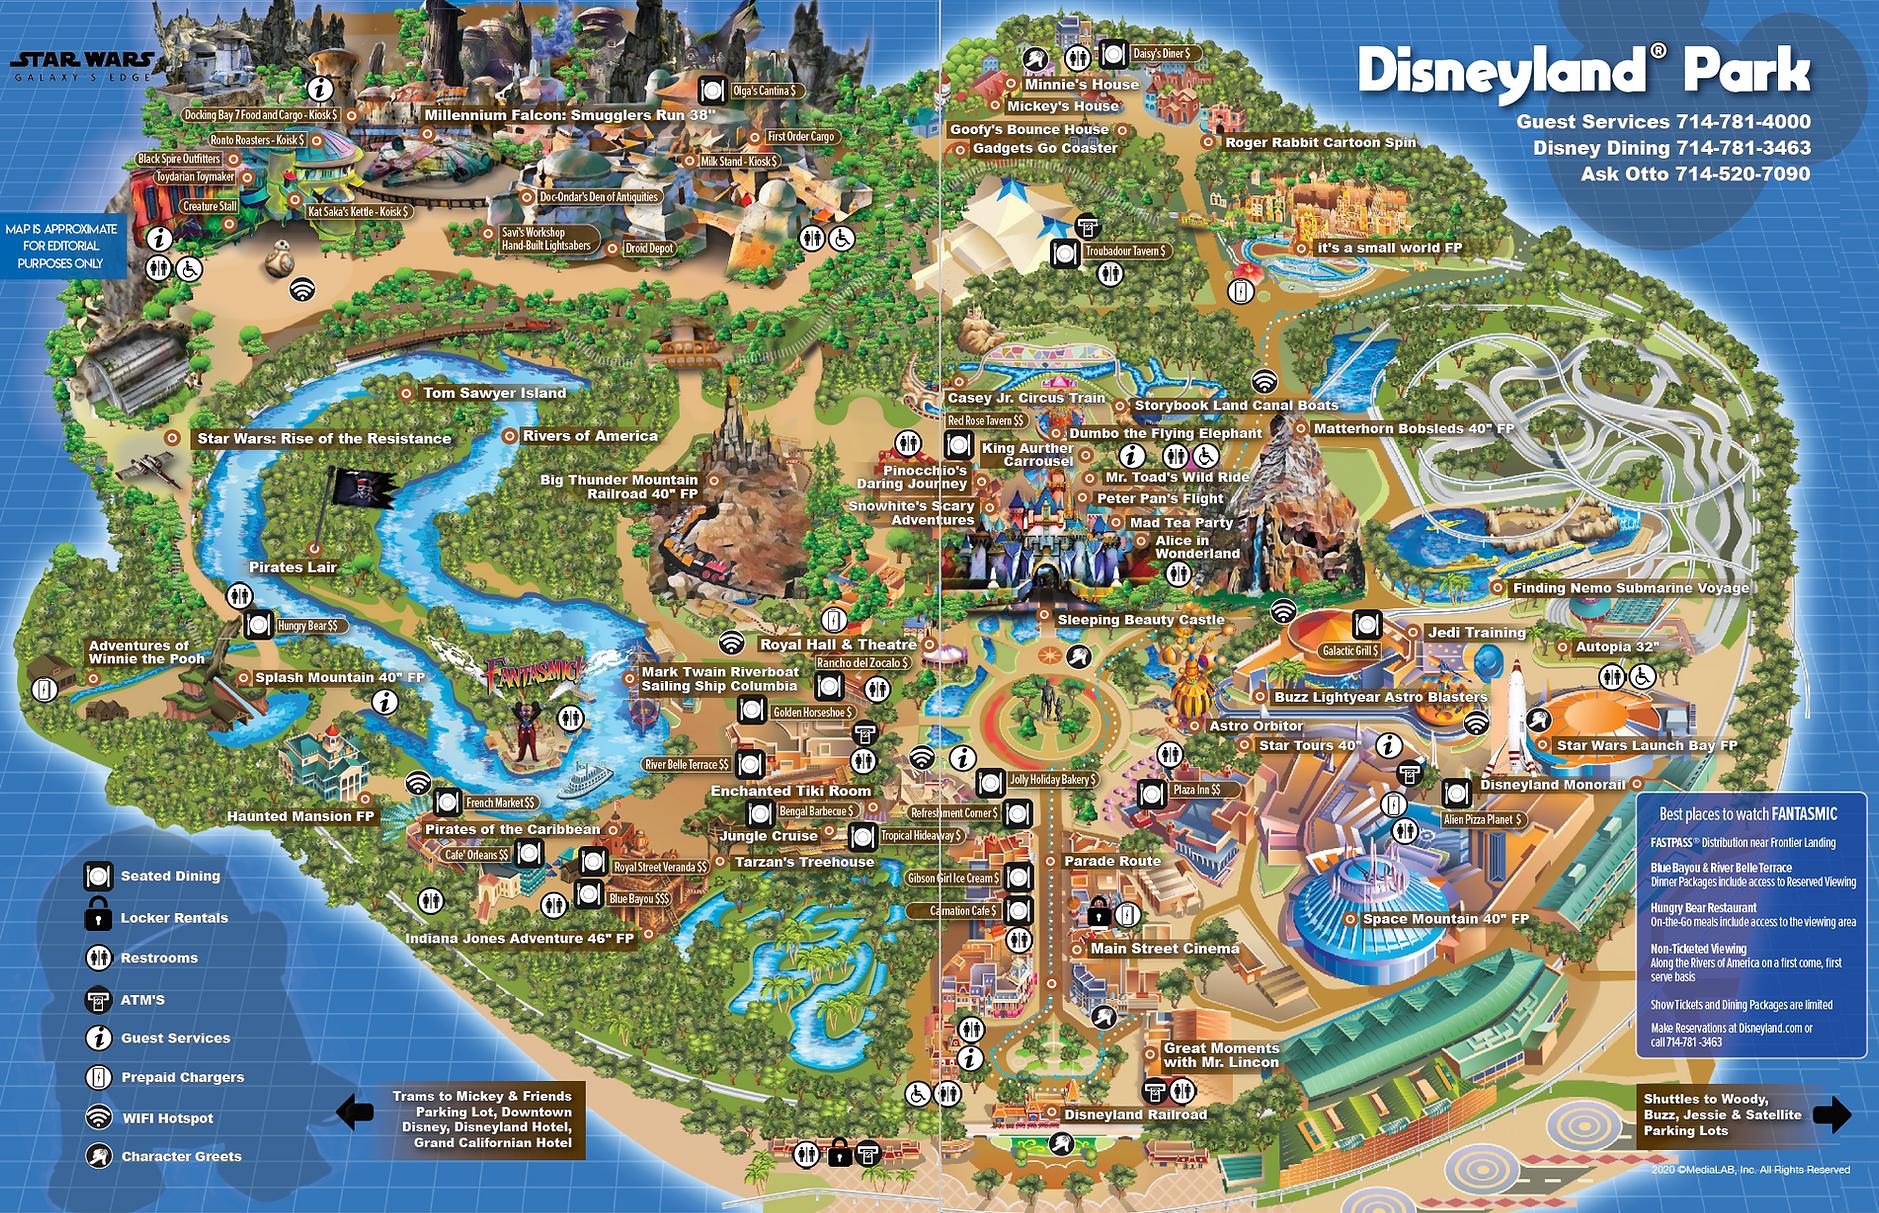 Disneyland park map.png